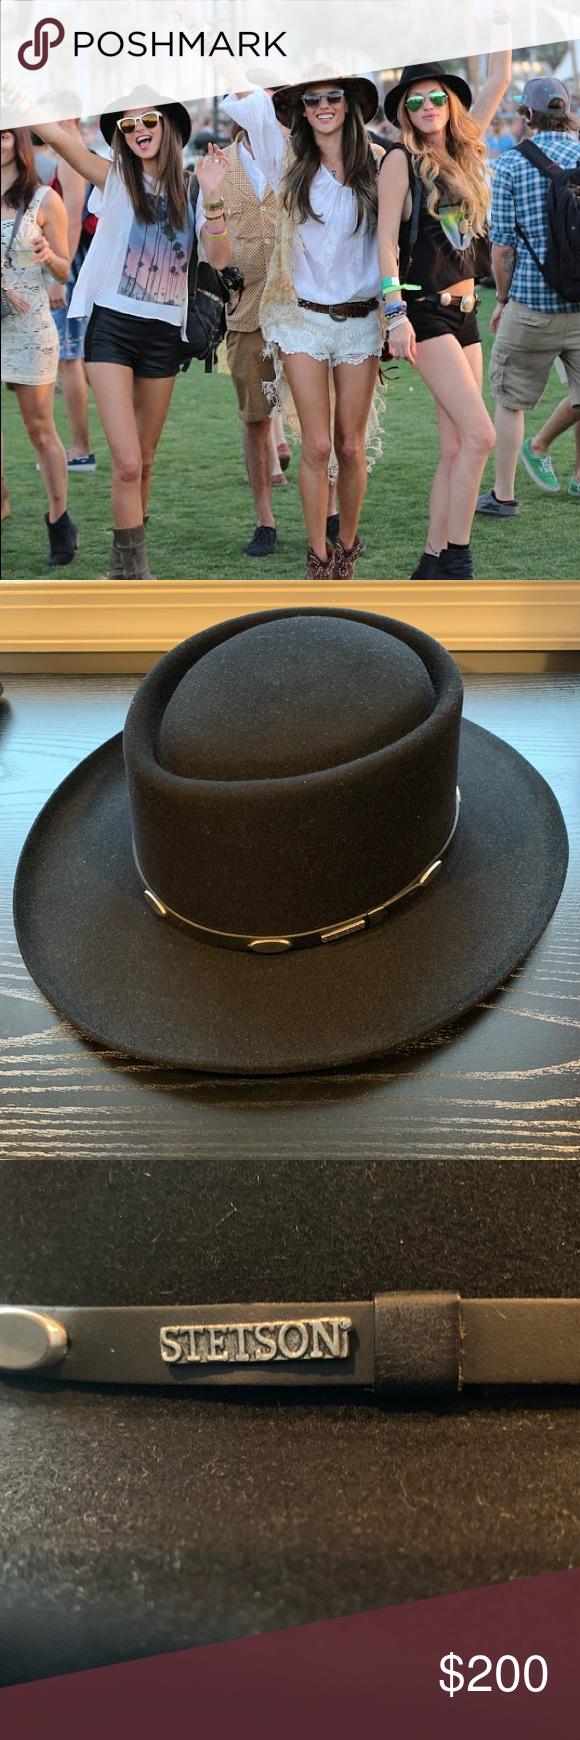 Stetson Gun Club Hat Brand new with tags Stestson Gun Club Hat. Great  classic and bdd990c7a51